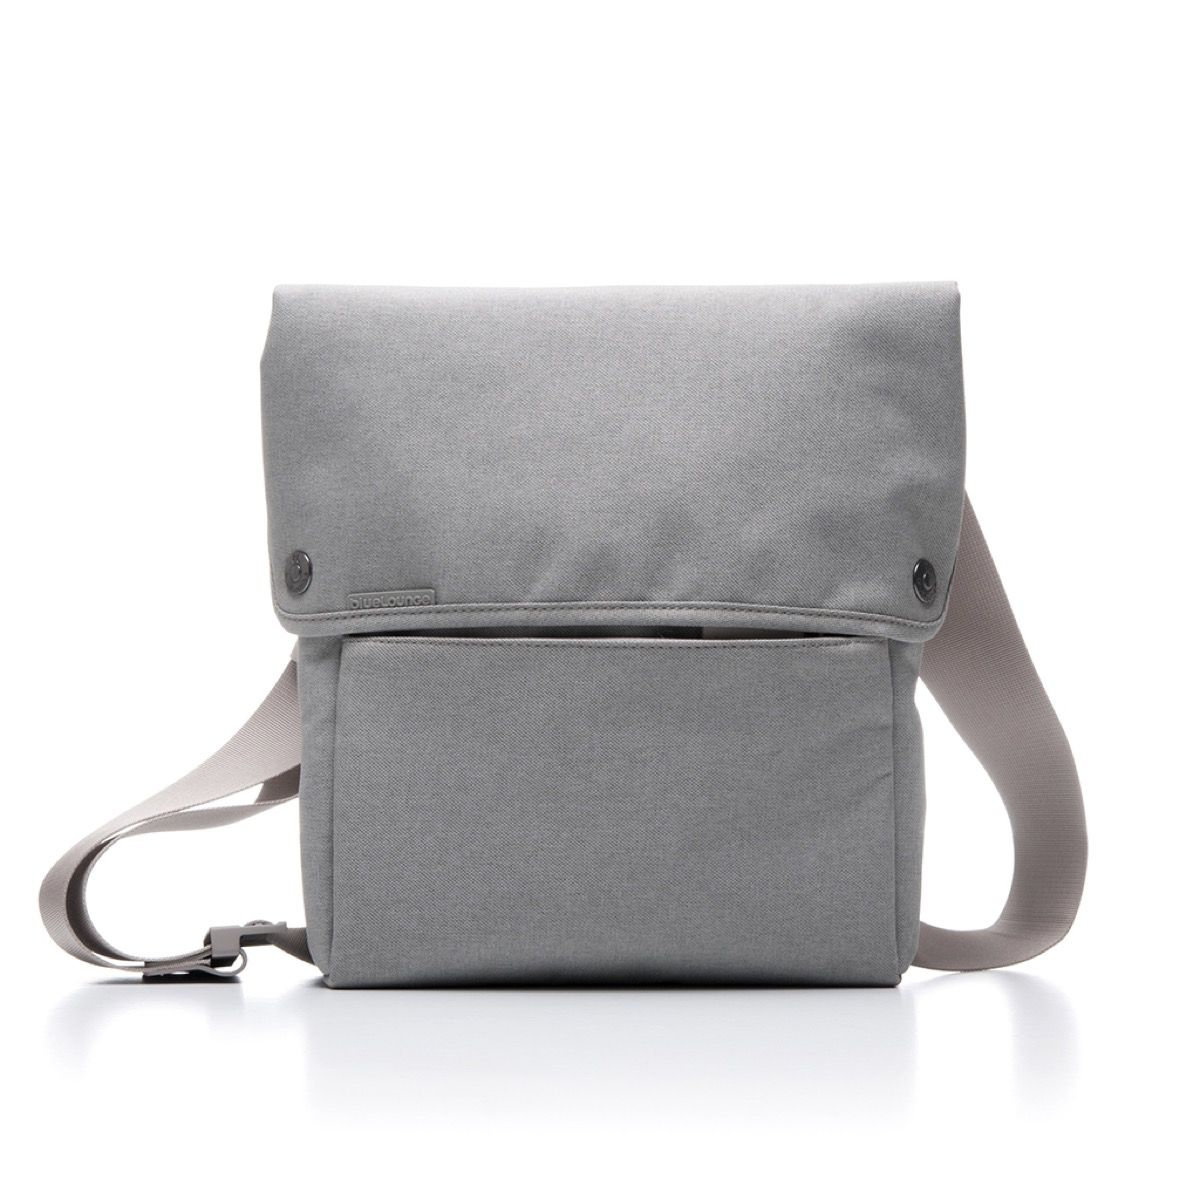 Bluelounge iPad Sling Messenger Bag